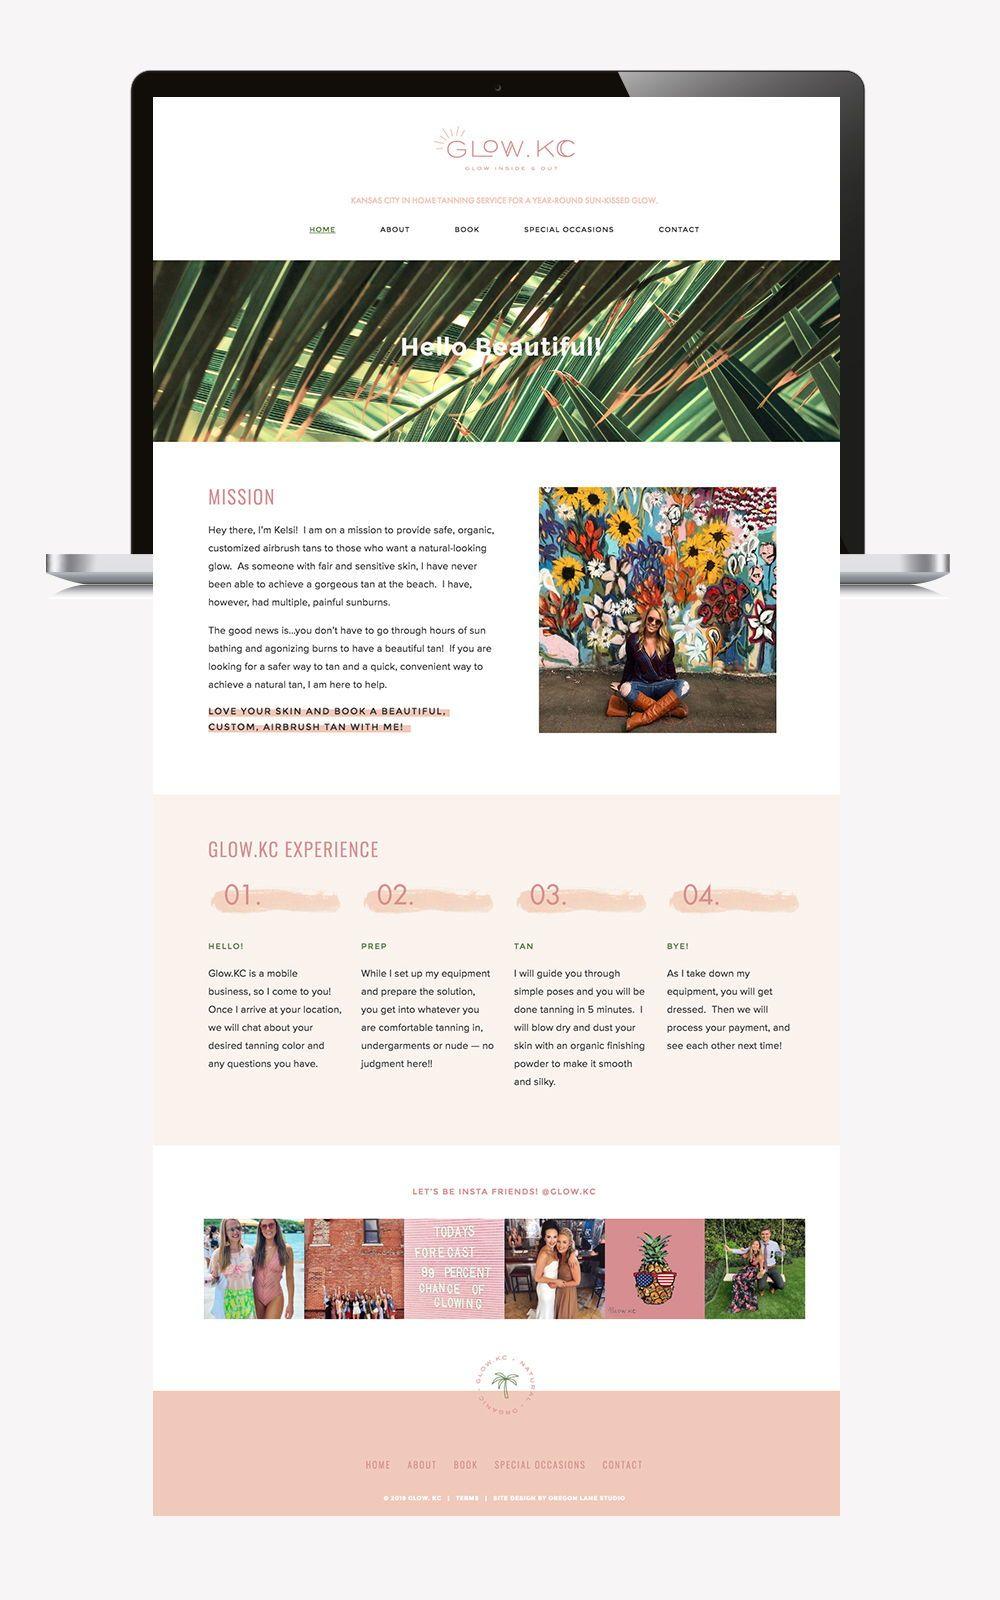 julesdesignco Instagram profile, stories, photos and videos